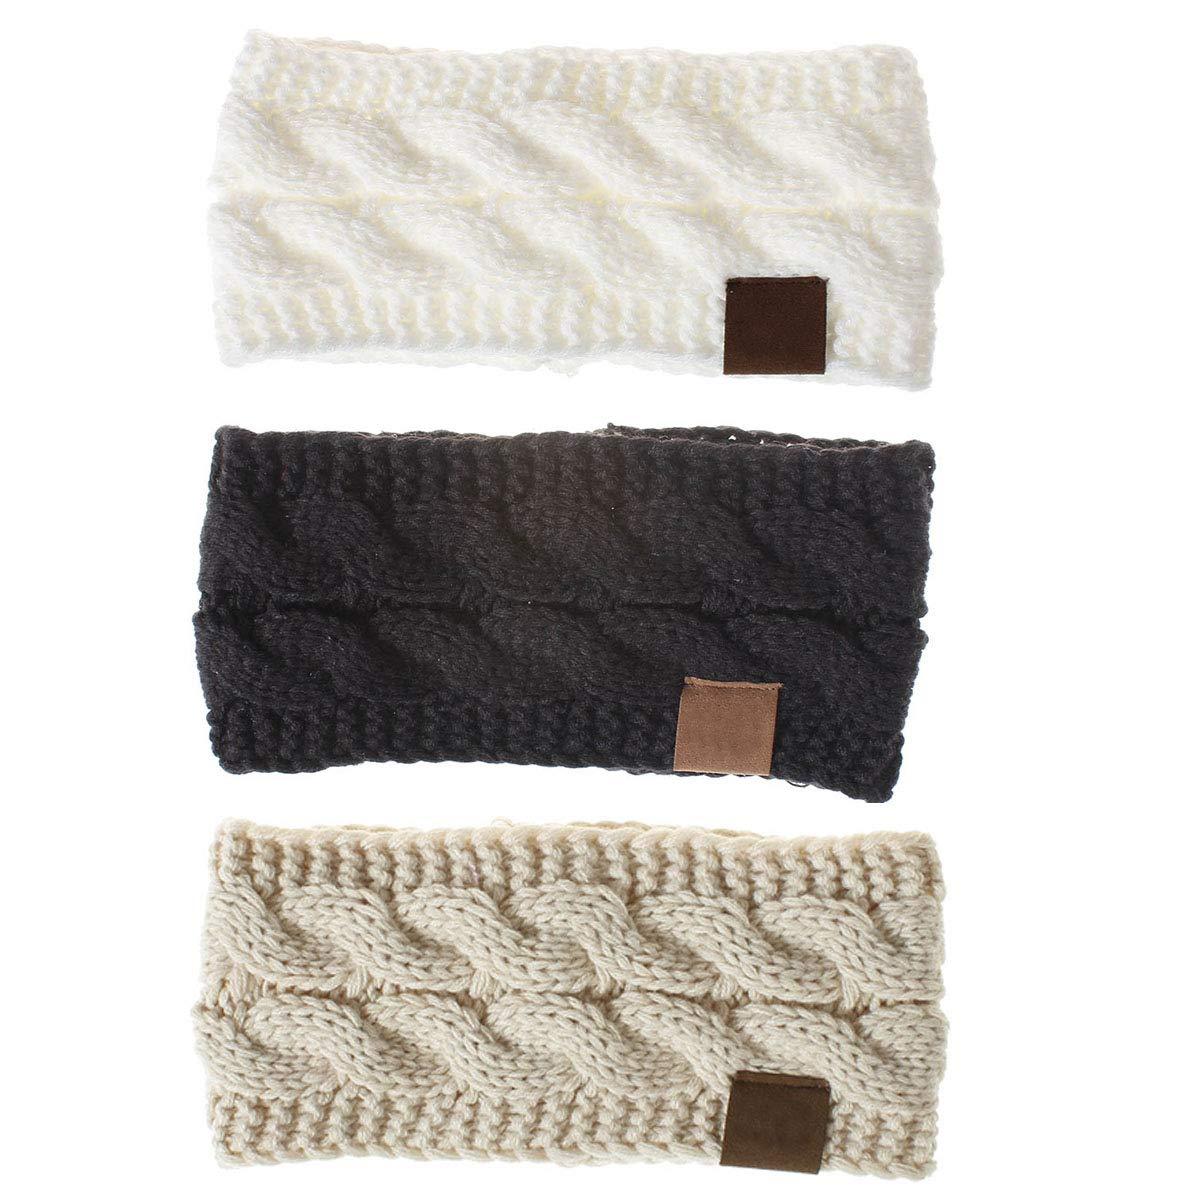 3 Pcs Woman Soft Stretch Ear Warmers Headbands Crochet Cable Knit Head Wraps Autumn and Winter Keep Warm Headband Hair Band (C#)